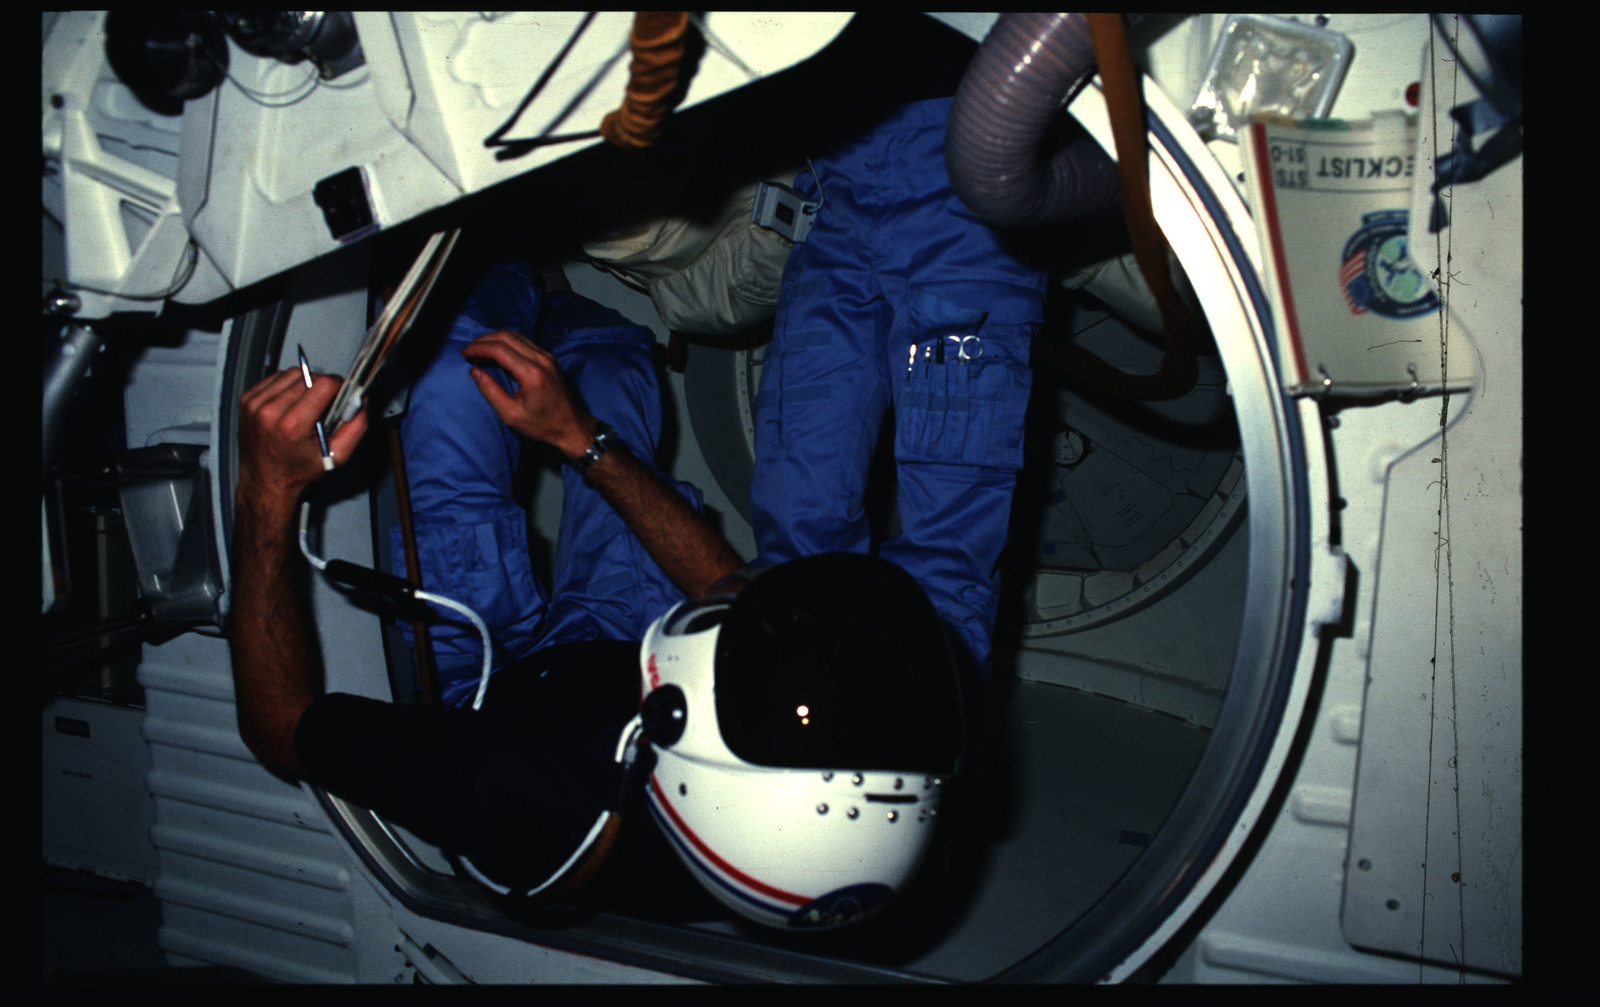 51D-06-037 - STS-51D - 51D crew activities